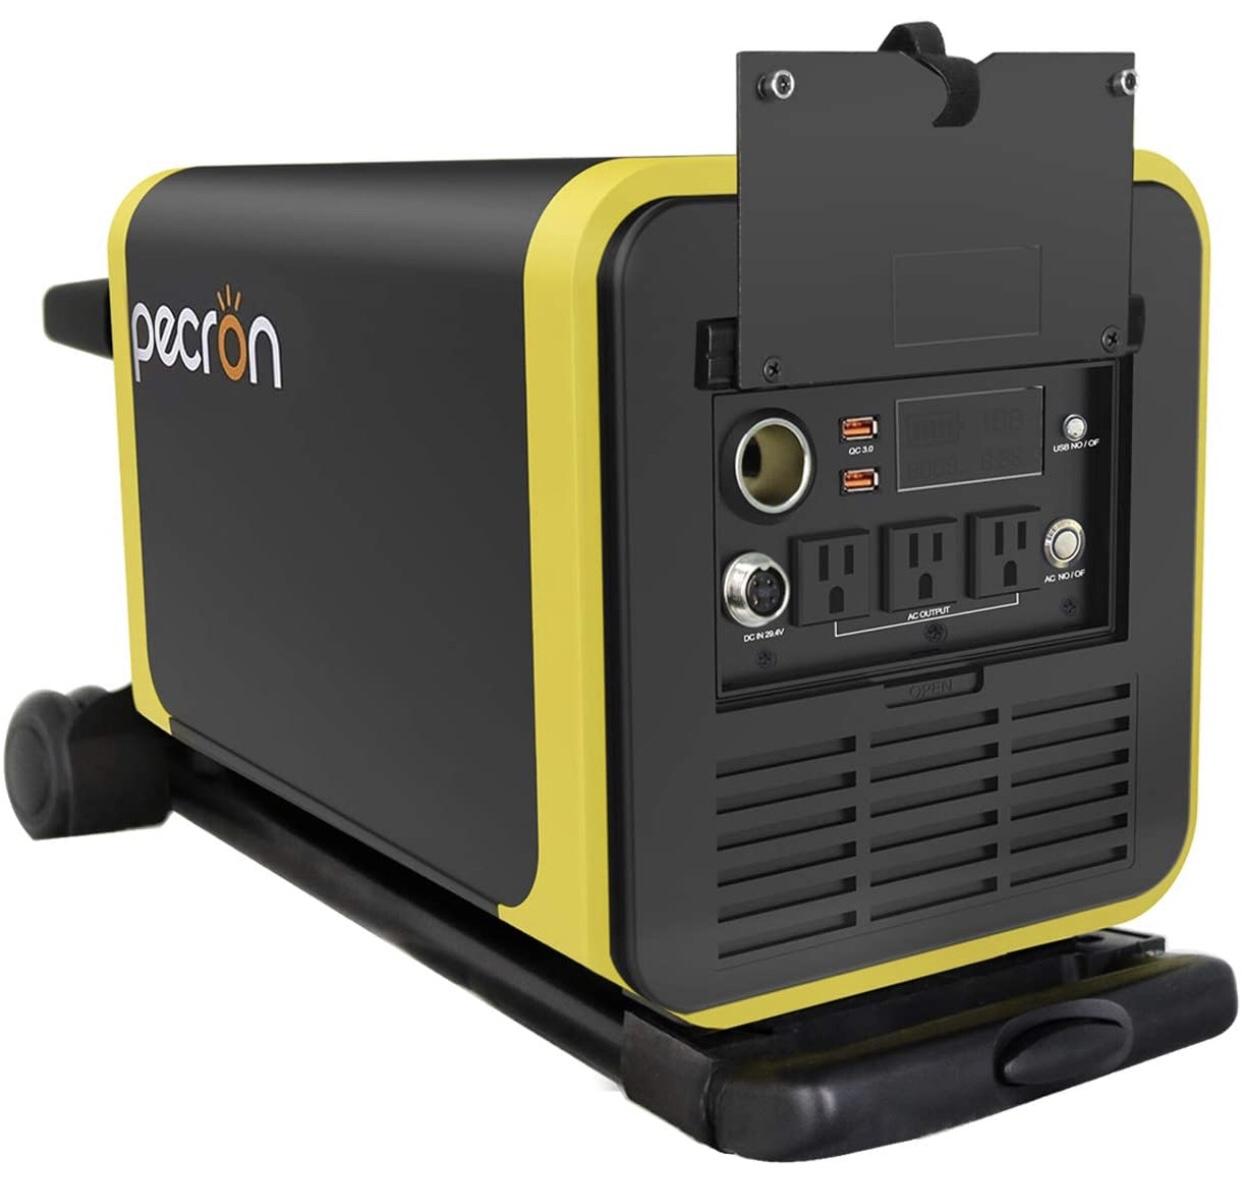 A display of the Pecron Q3000S Solar Generator